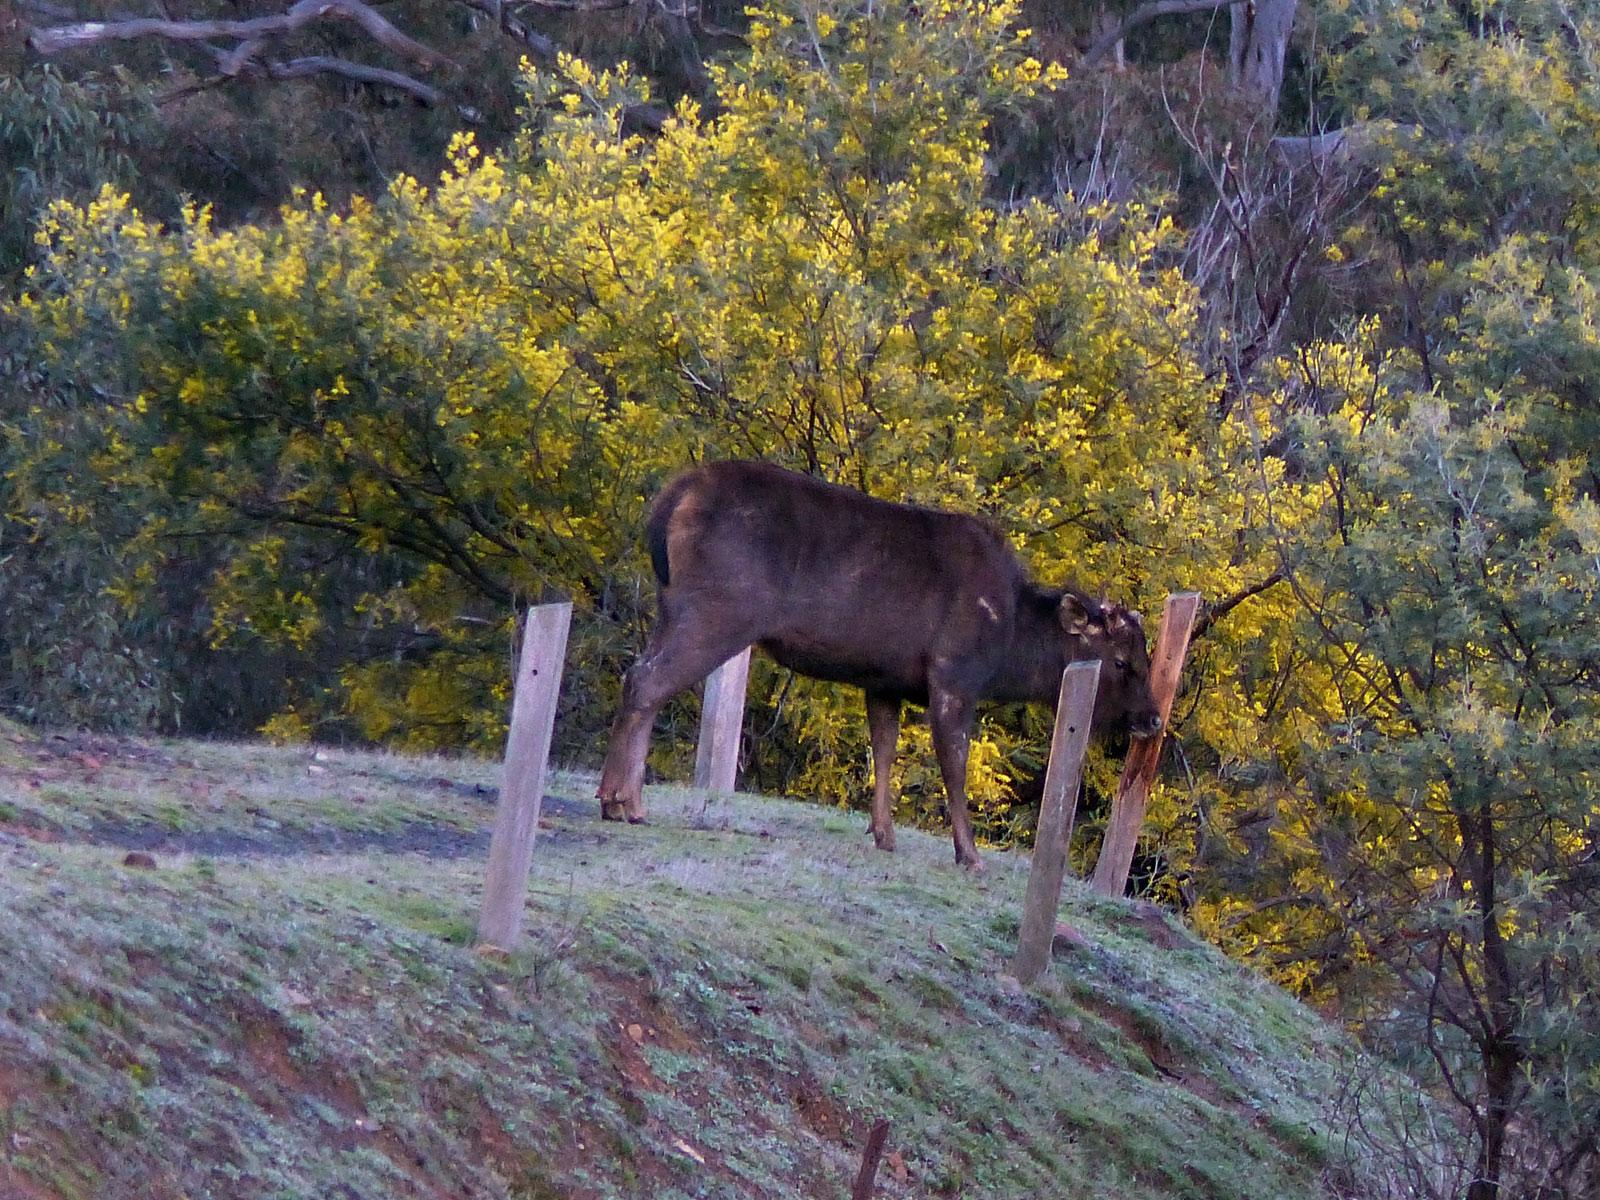 sambar stag rubbing